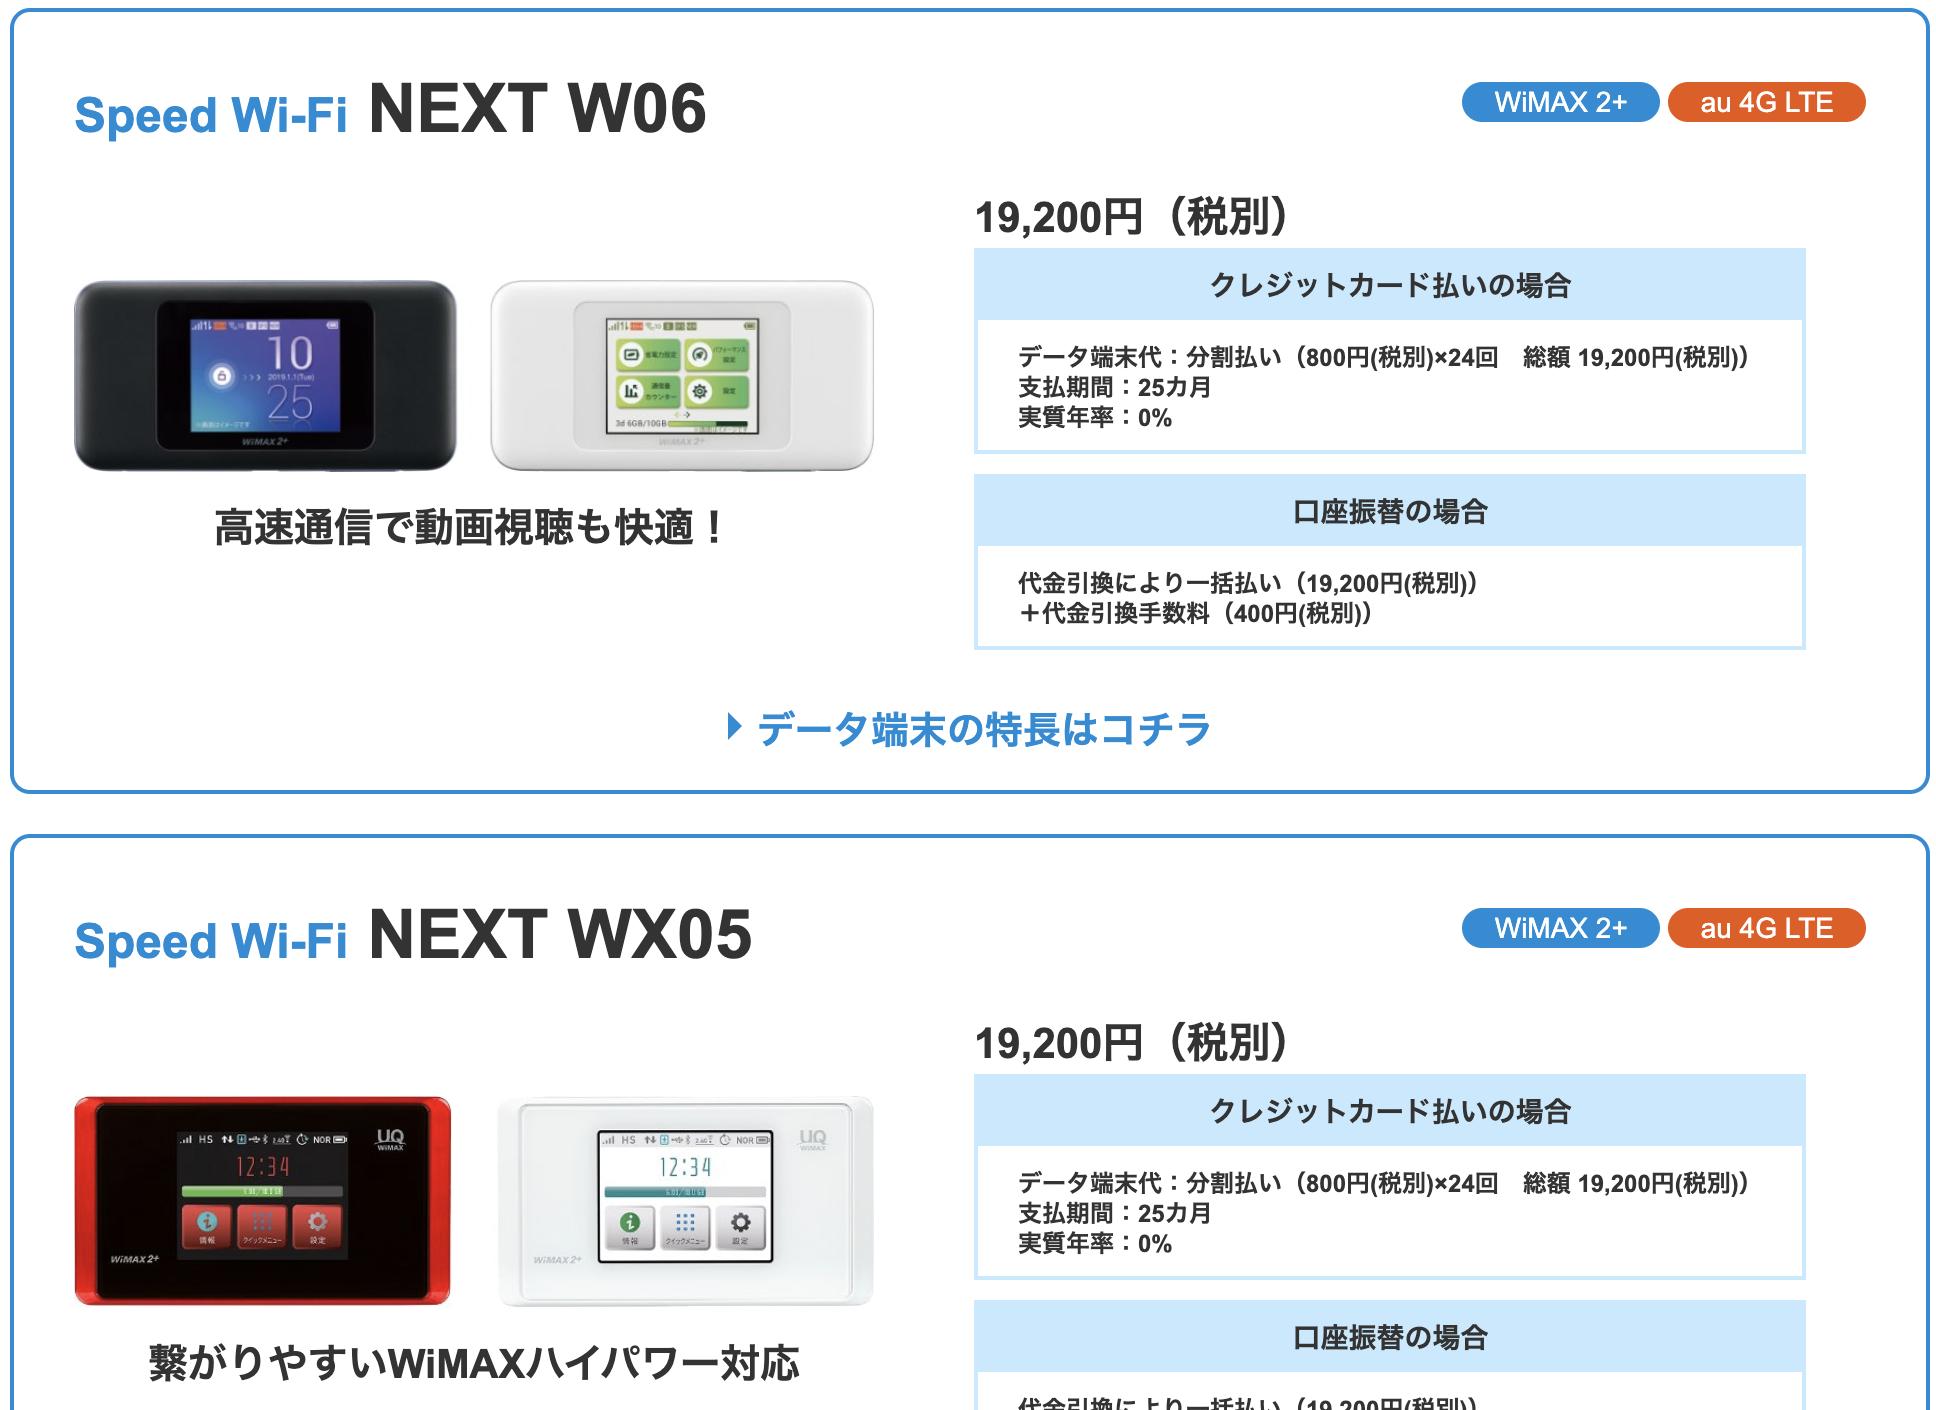 BIGLOBE WiMAX2+ tanmatsu